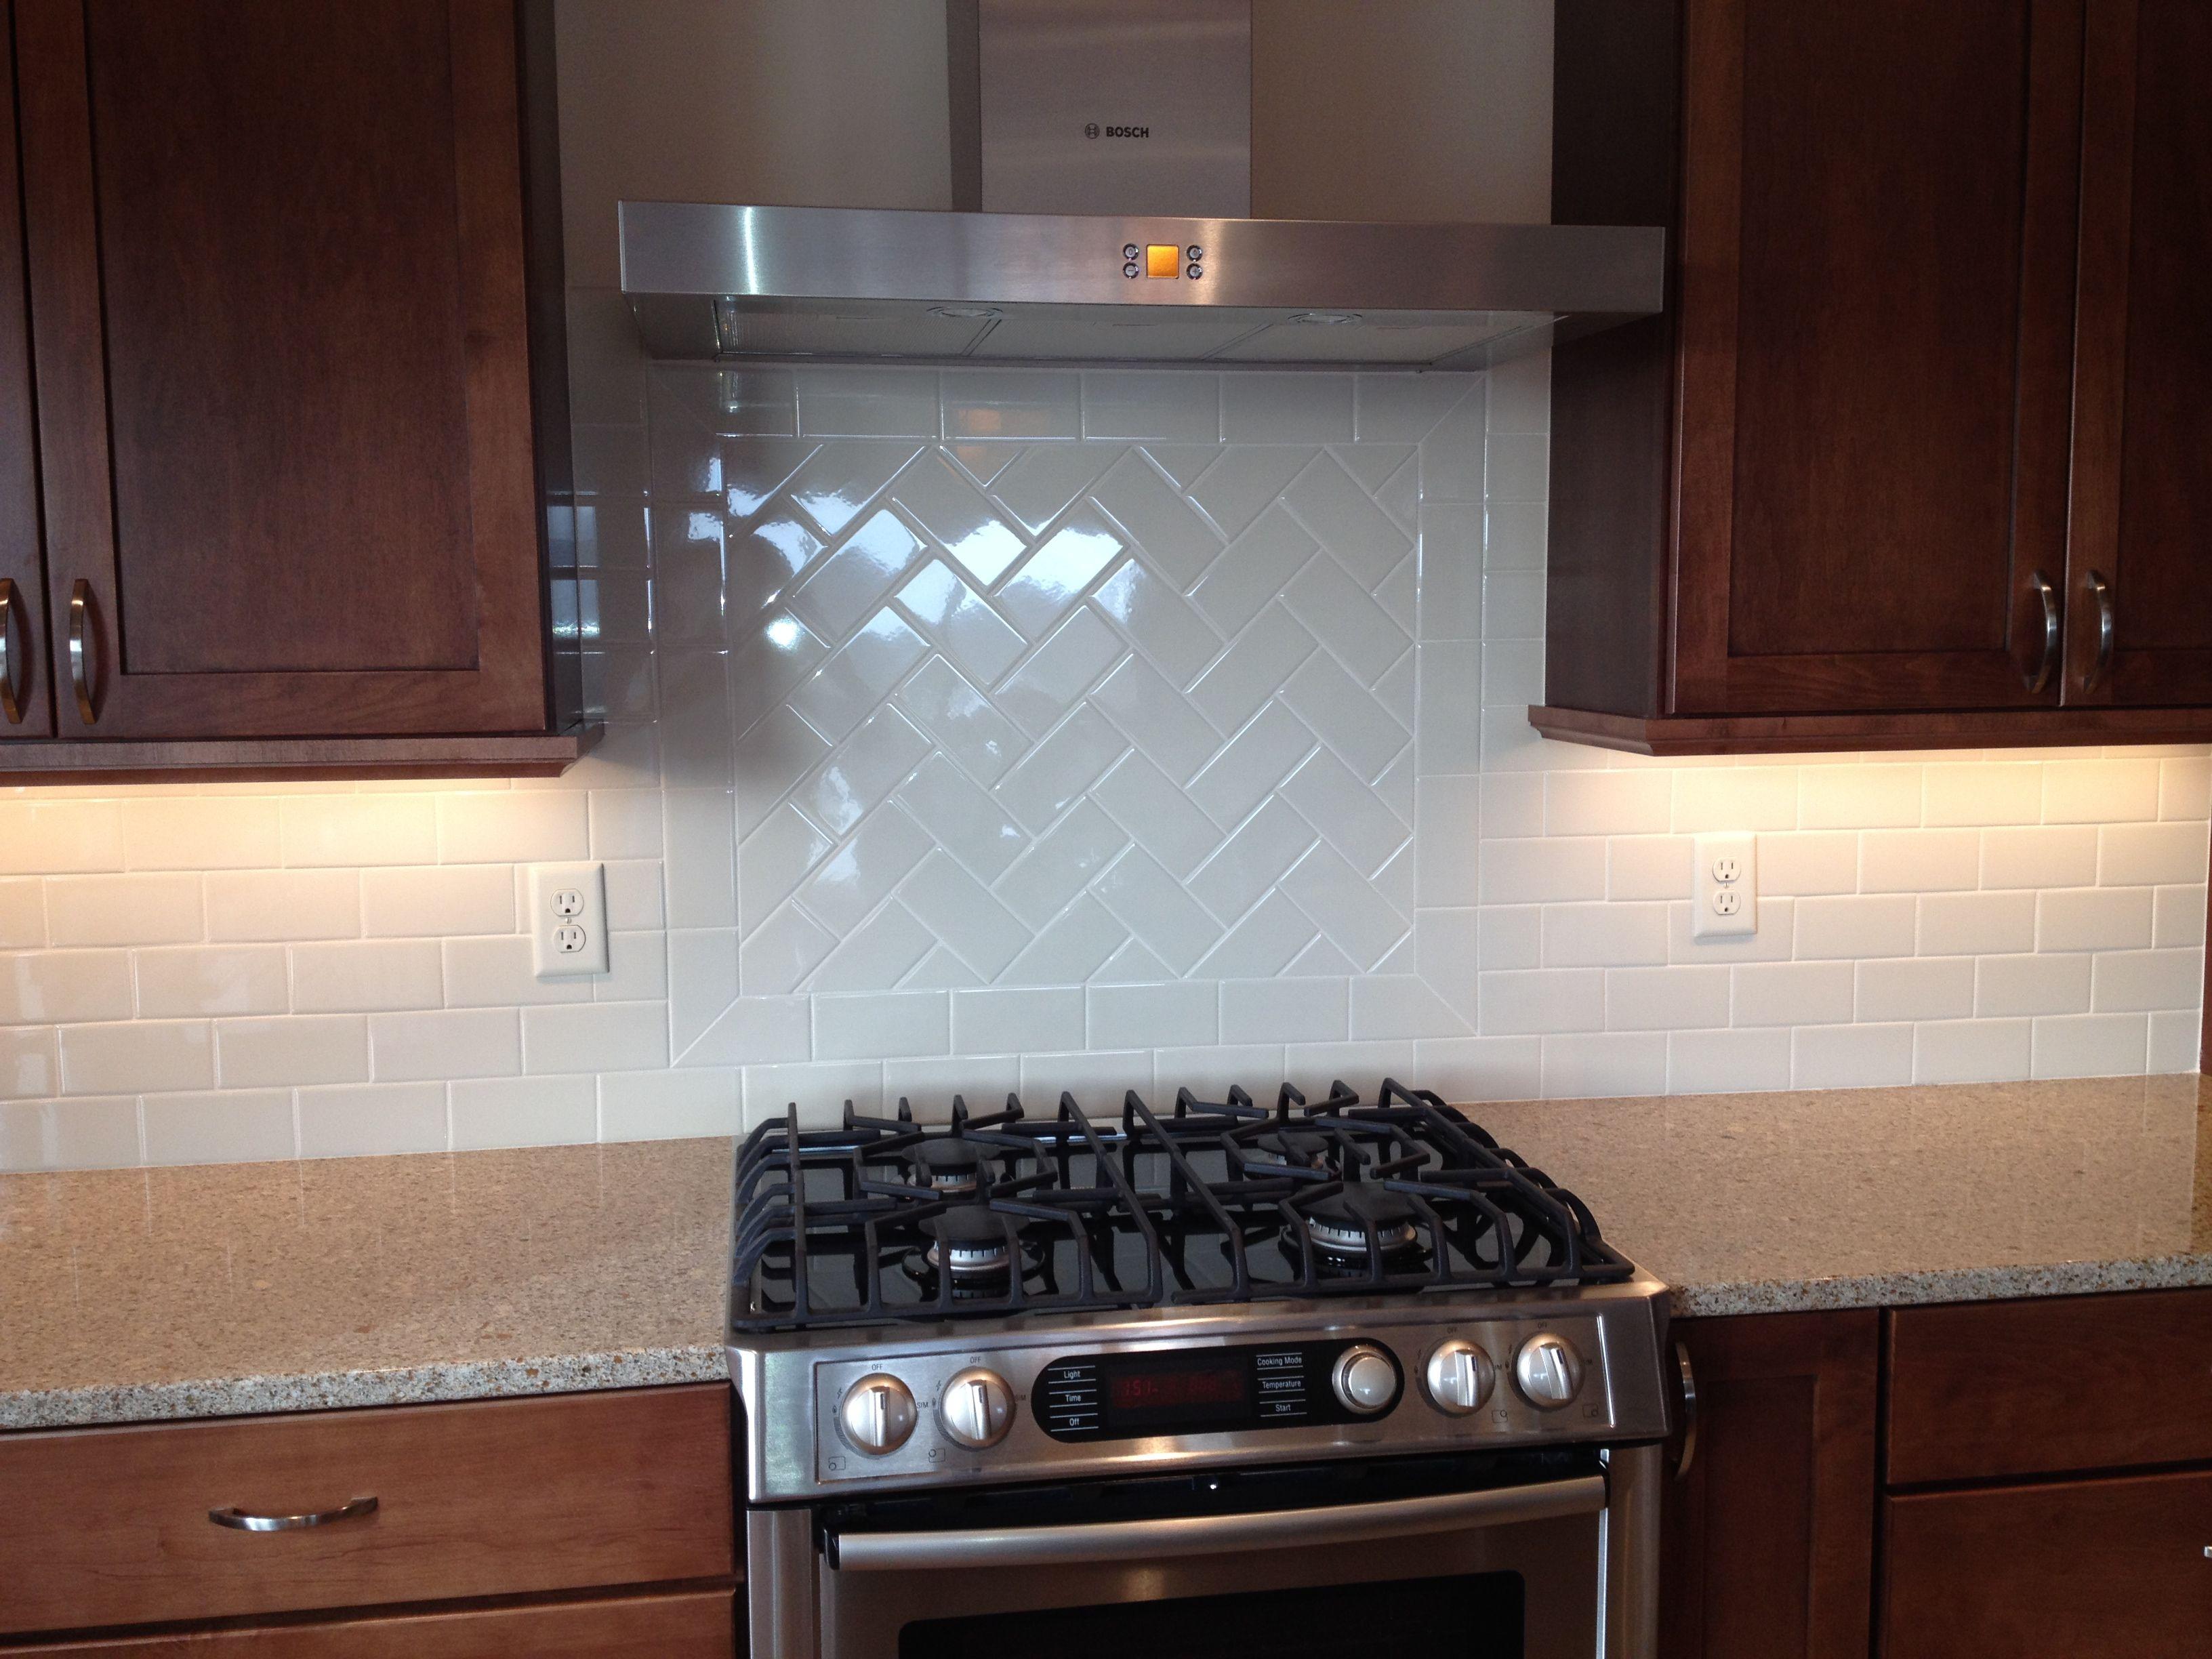 Gerard Homes Herringbone design in 3x6 subway tile | Design by ...